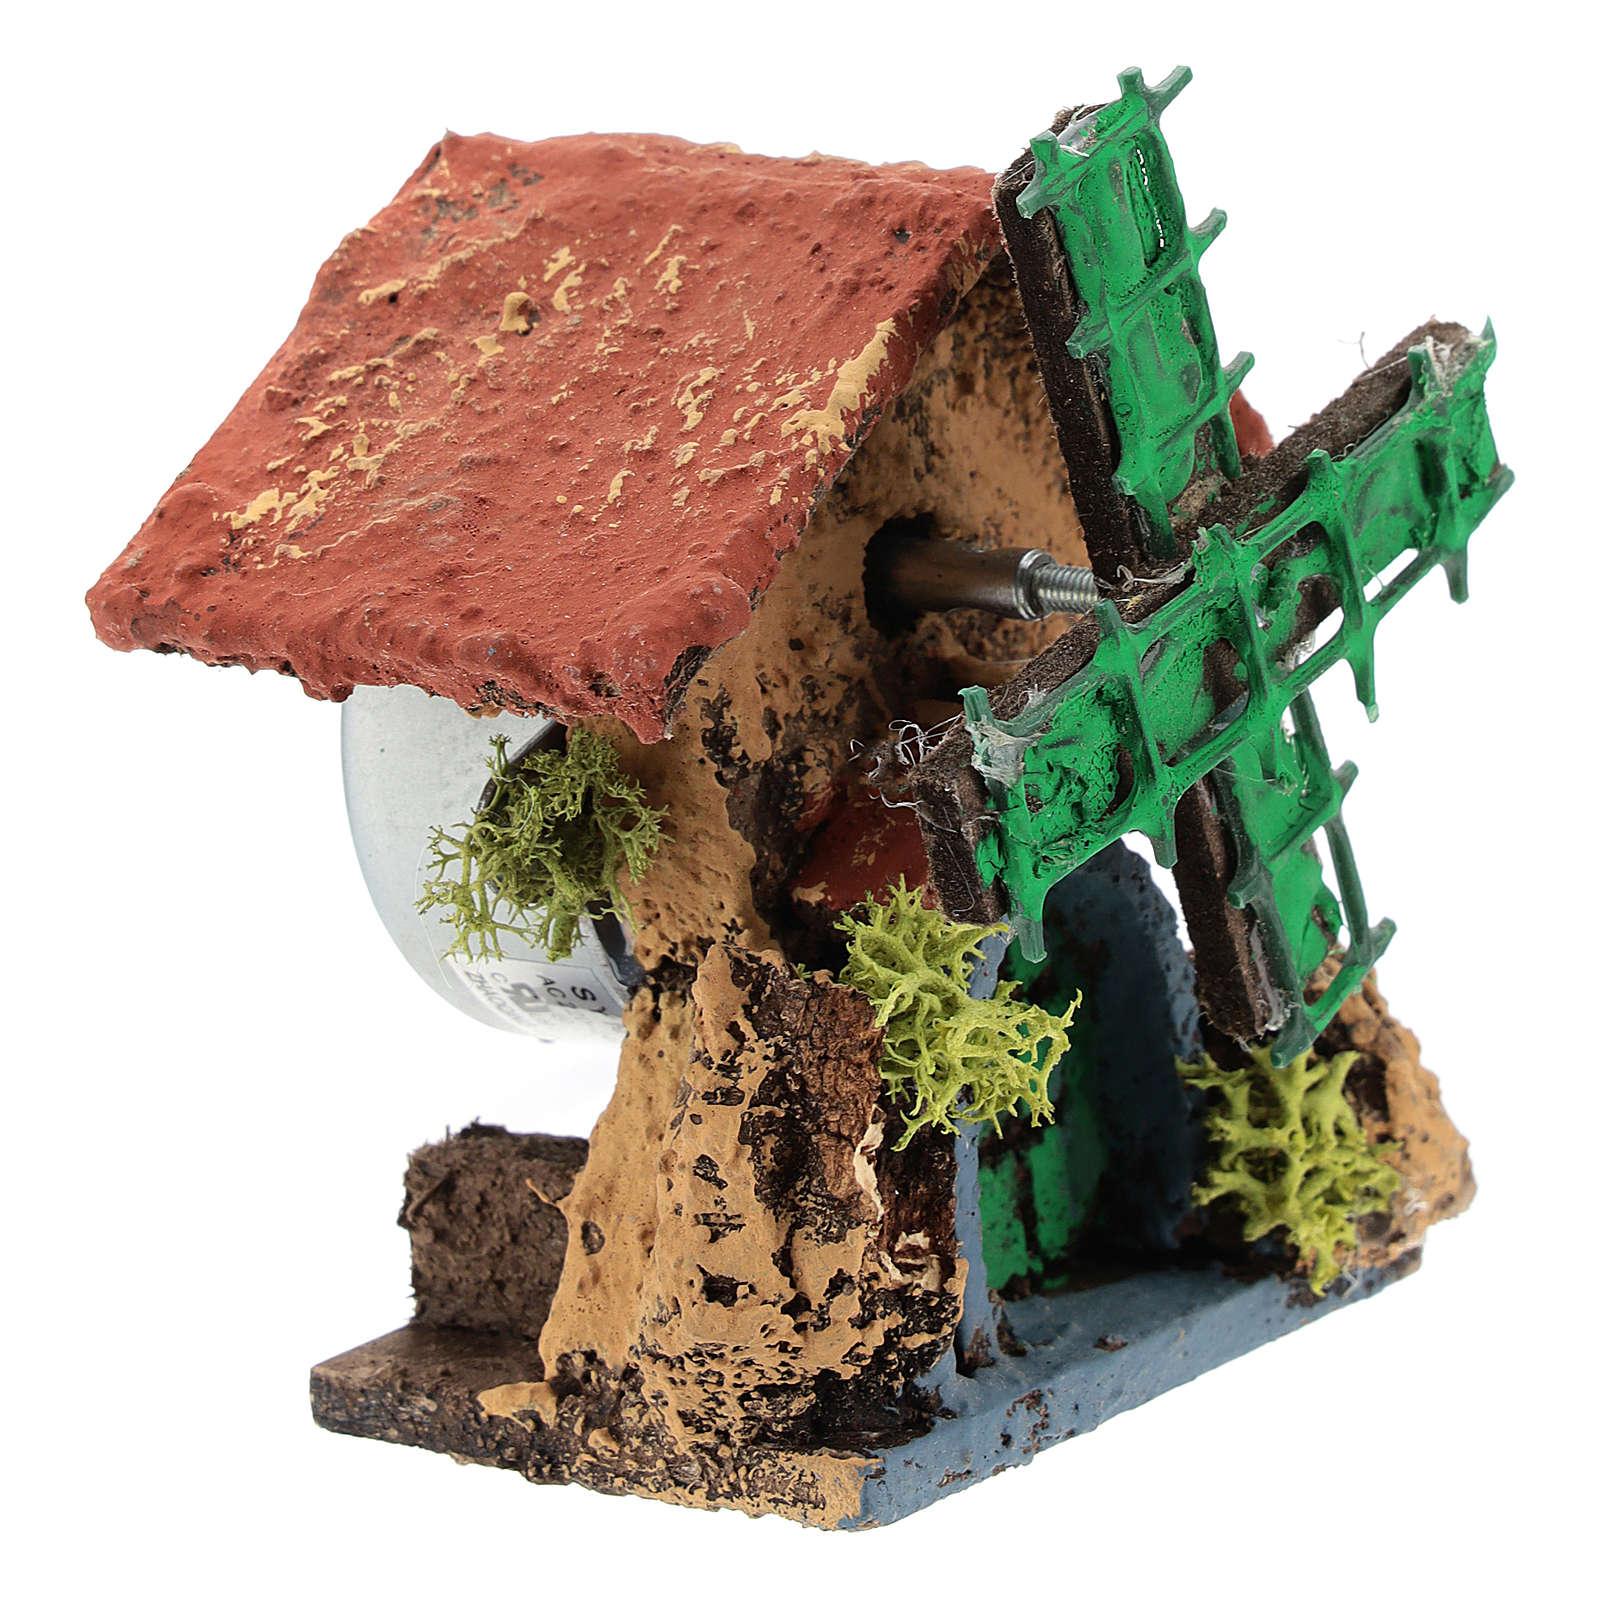 Hut with windmill 10x5x5 cm for Neapolitan Nativity scene of 4-6 cm 4